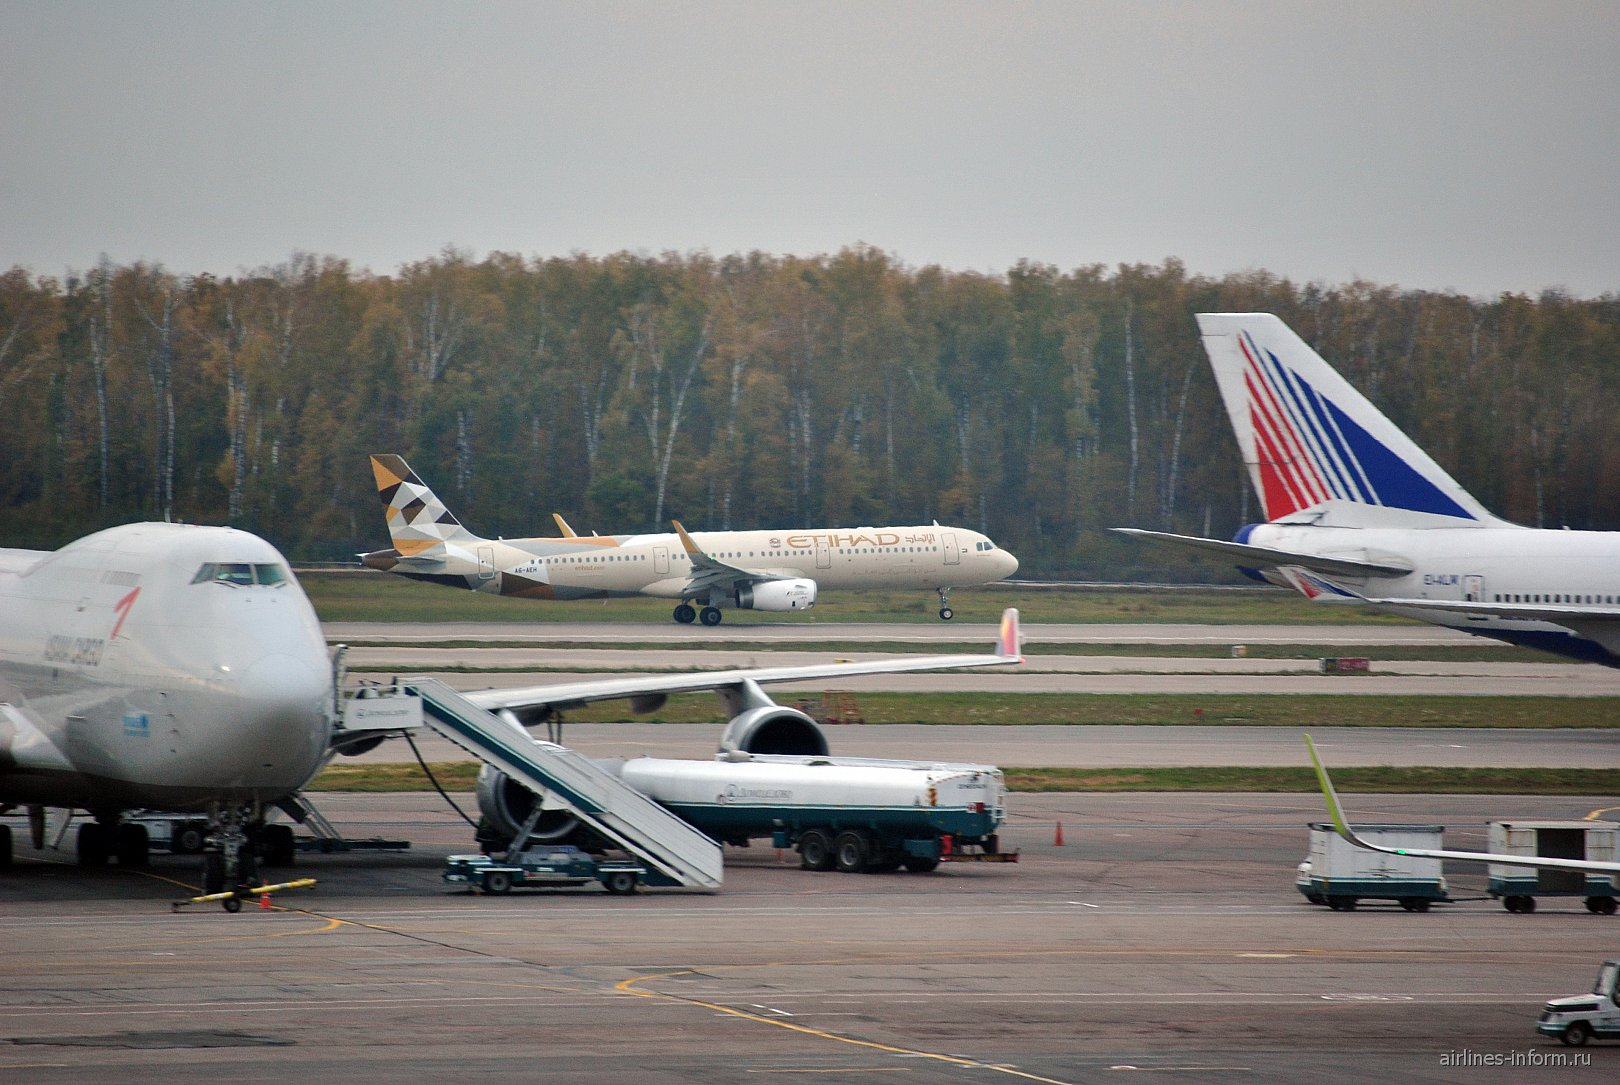 Взлет самолета Airbus A321 авиакомпании Etihad